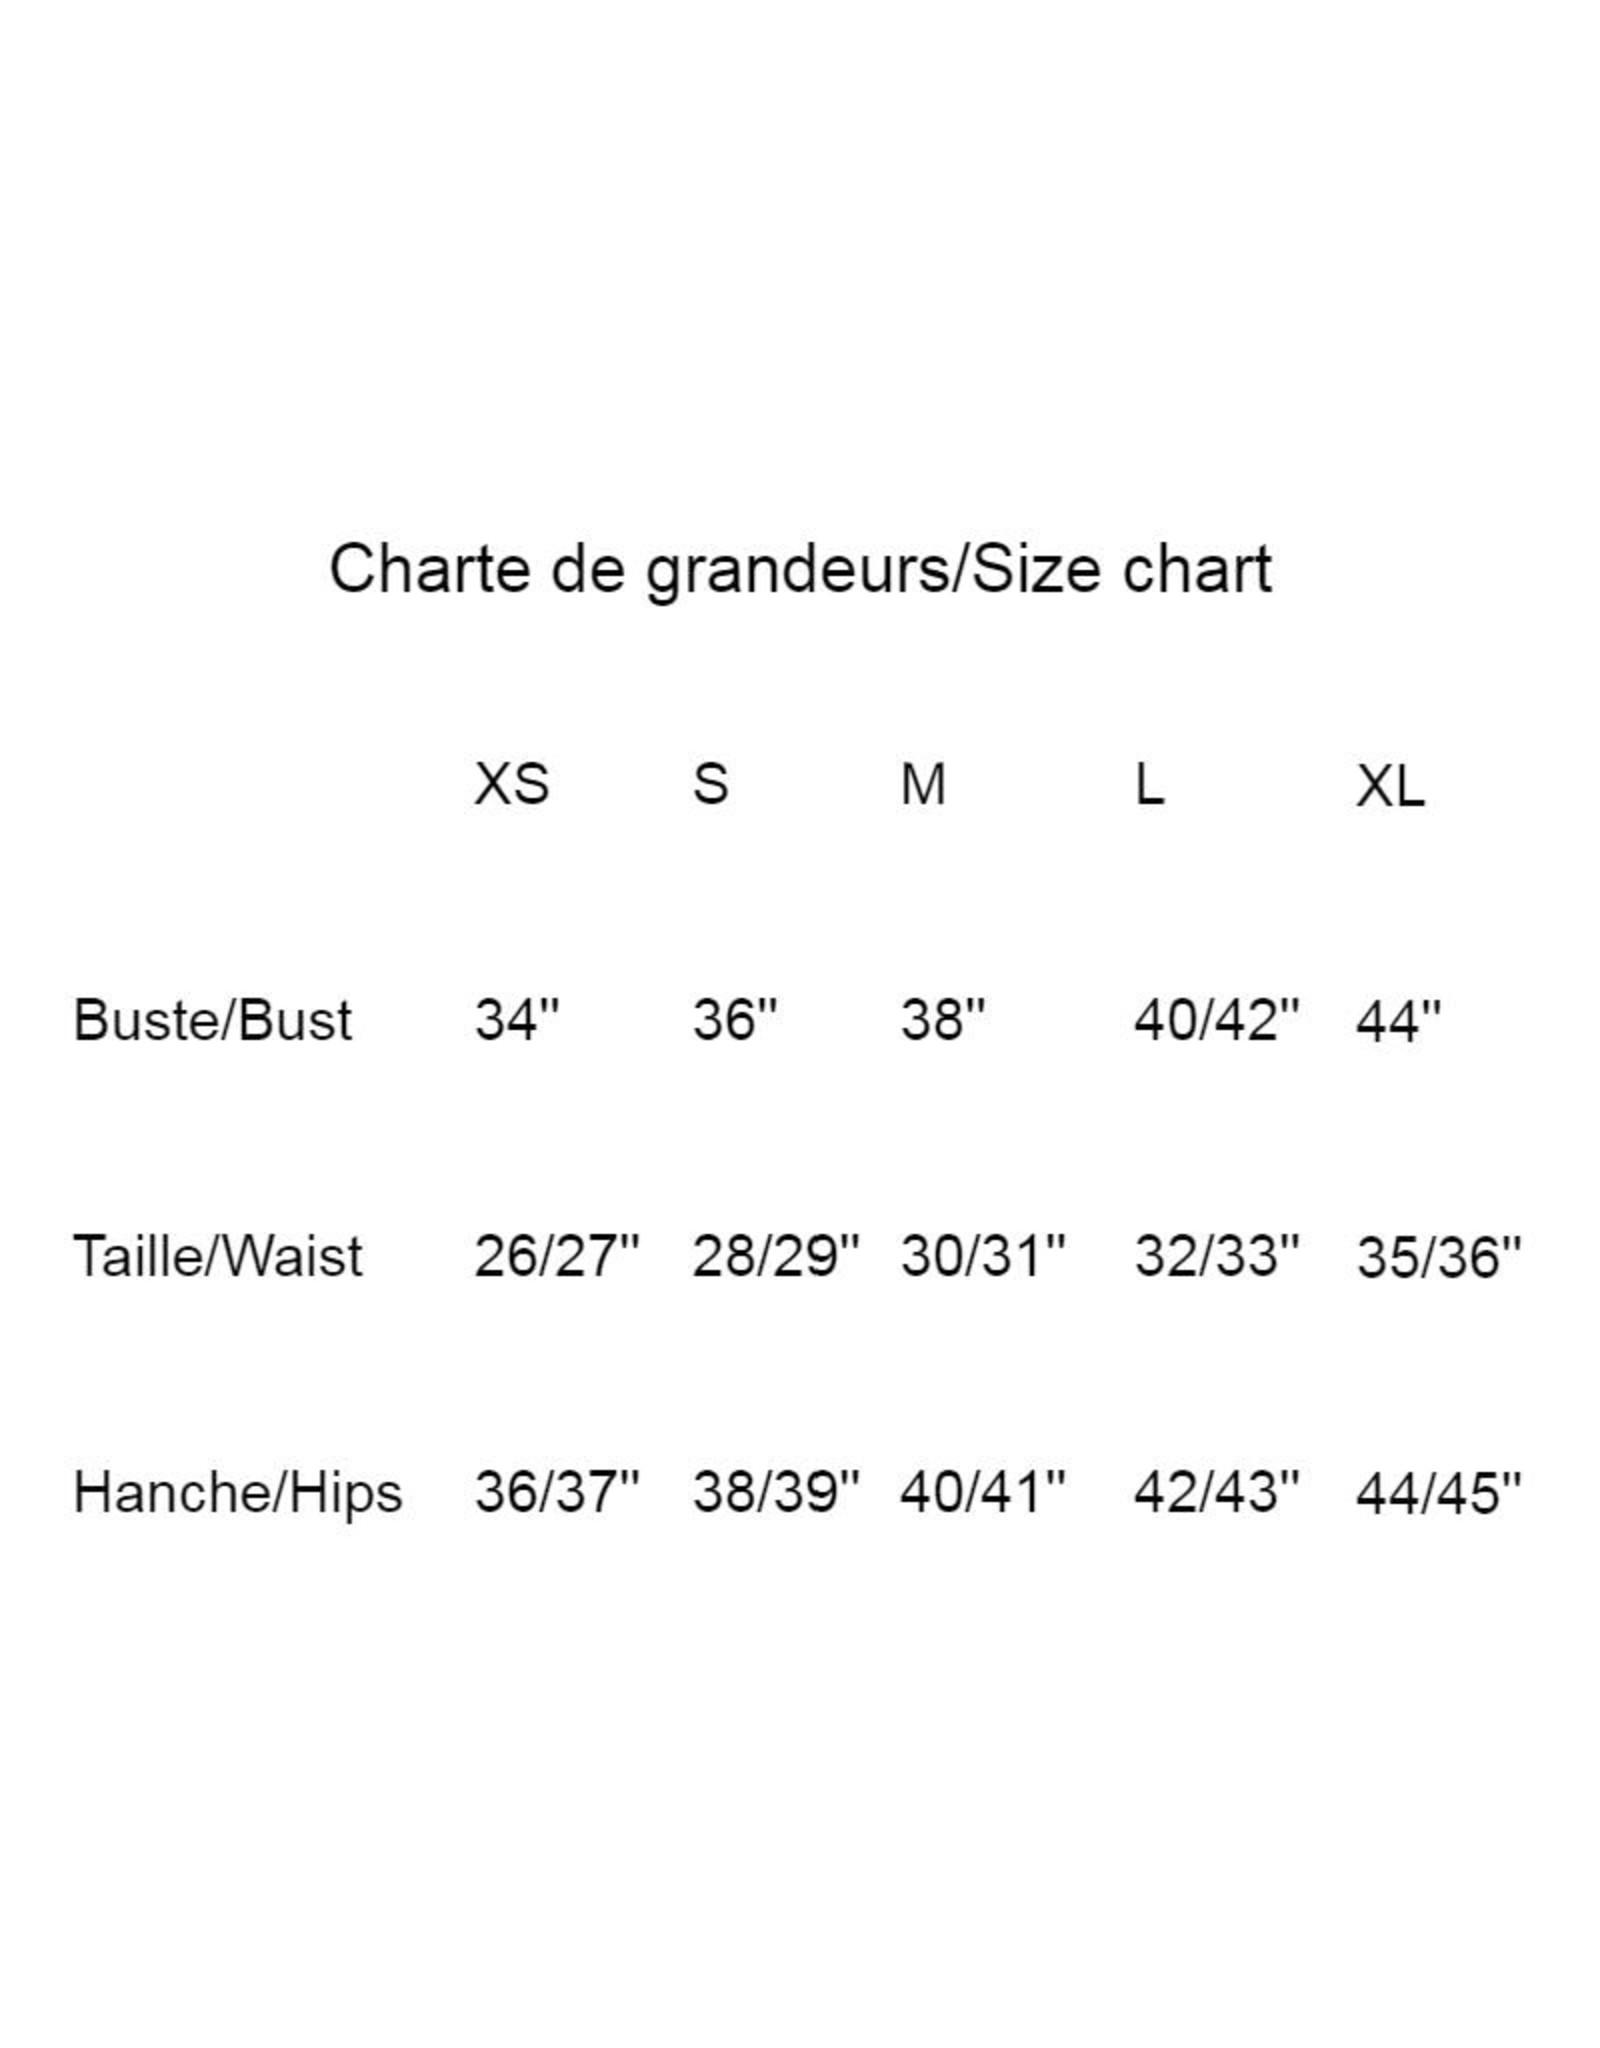 Les Coureurs de Jupons Chandail El Classico 3/4 Bambou AH1819 Les Coureurs de Jupons Noir